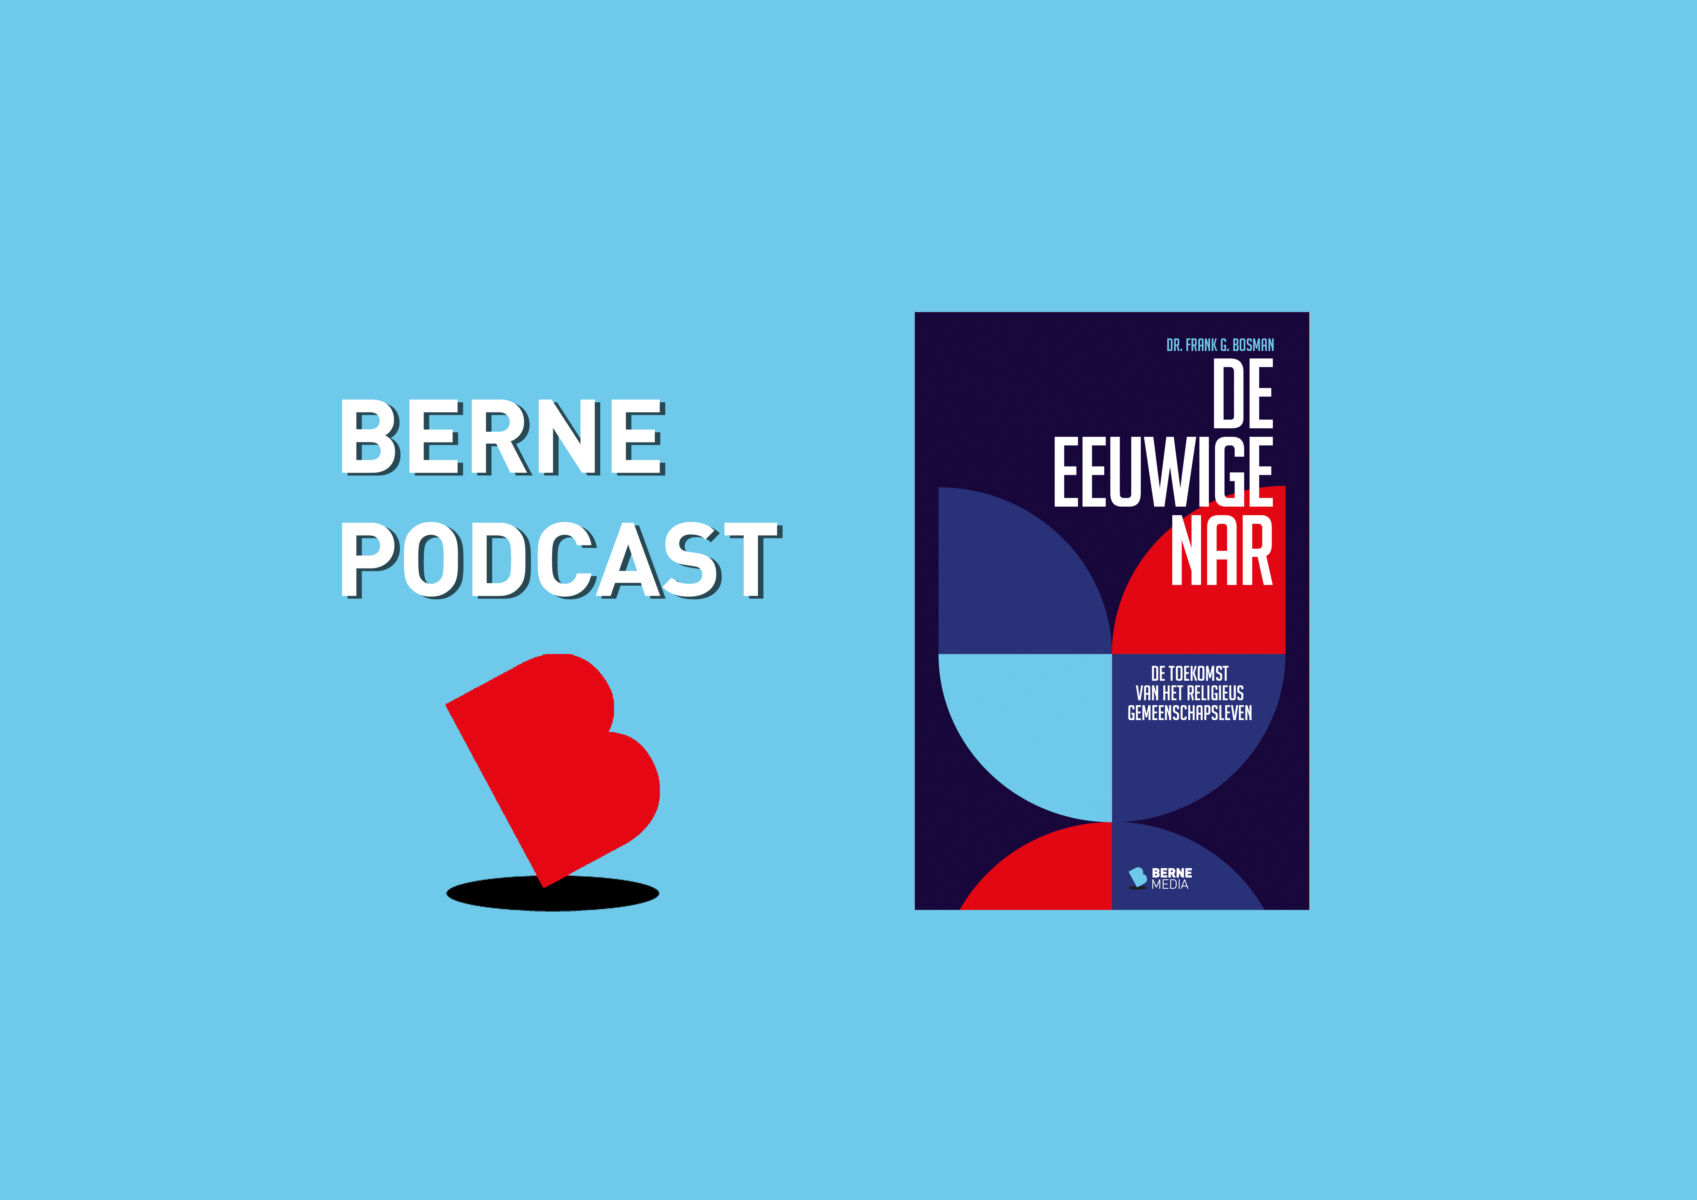 Berne_podcast